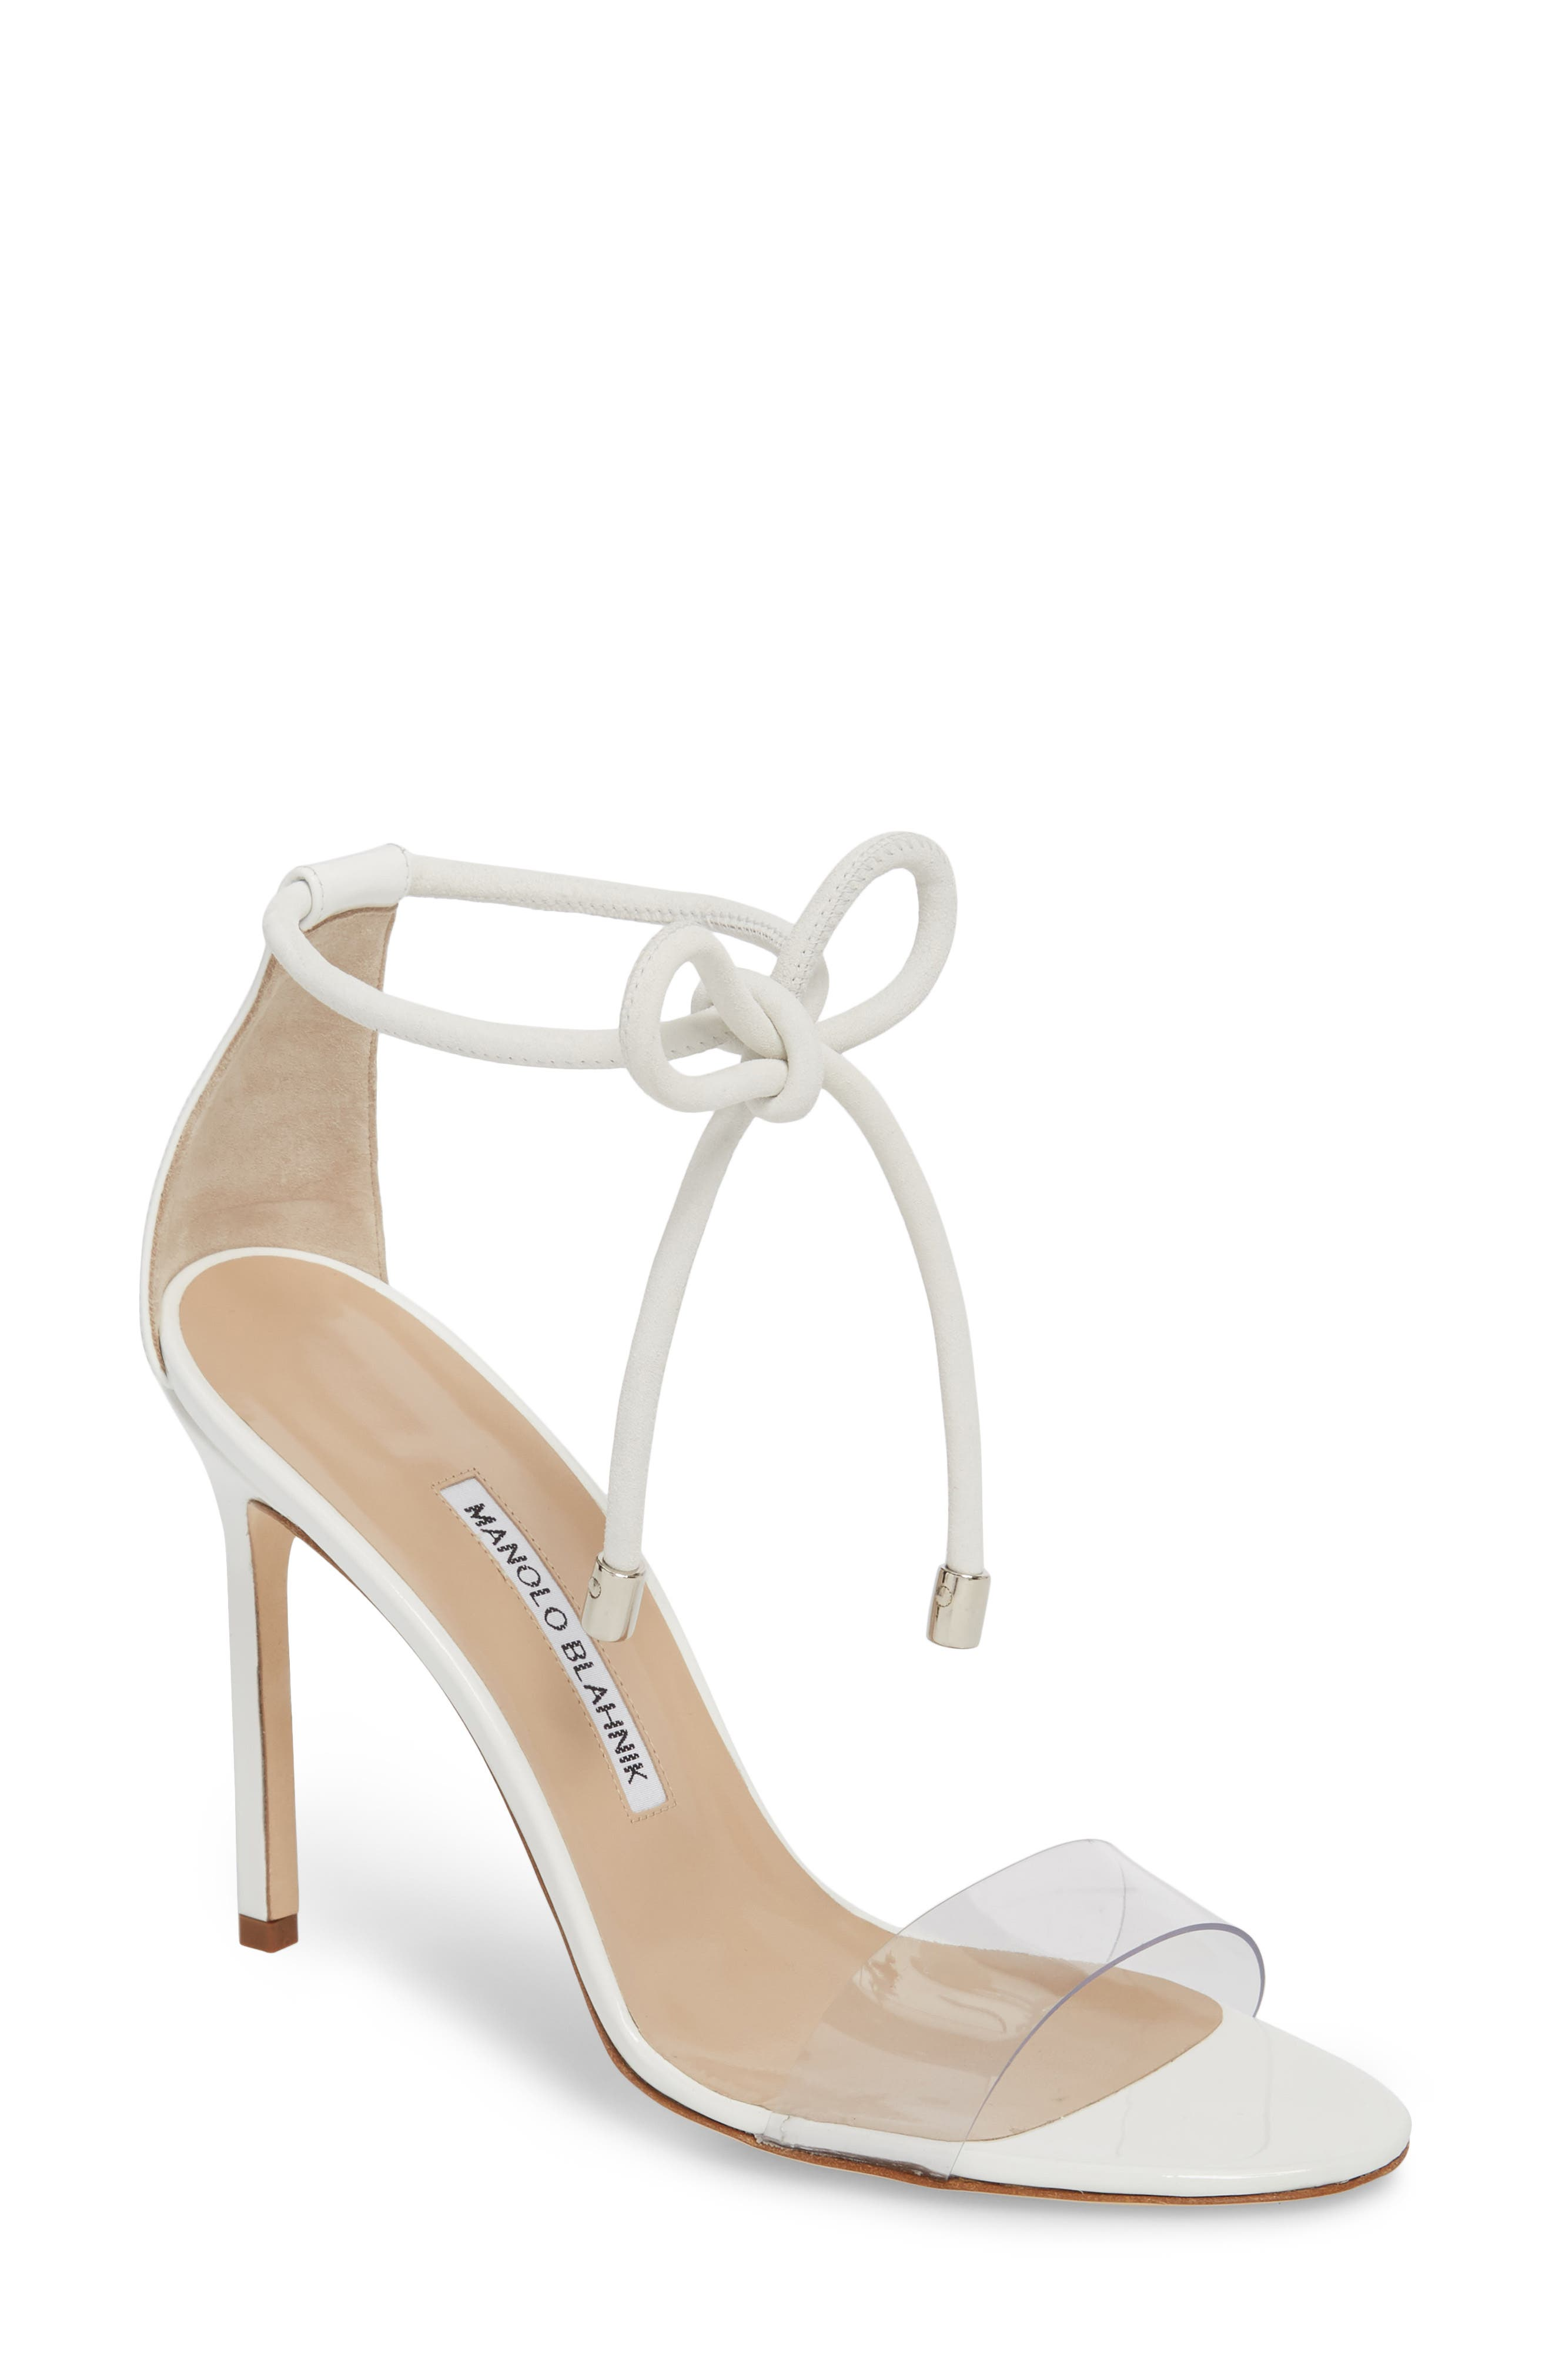 2014 new Manolo Blahnik Bicolor Multistrap Sandals sale Cheapest buy online GLrBa